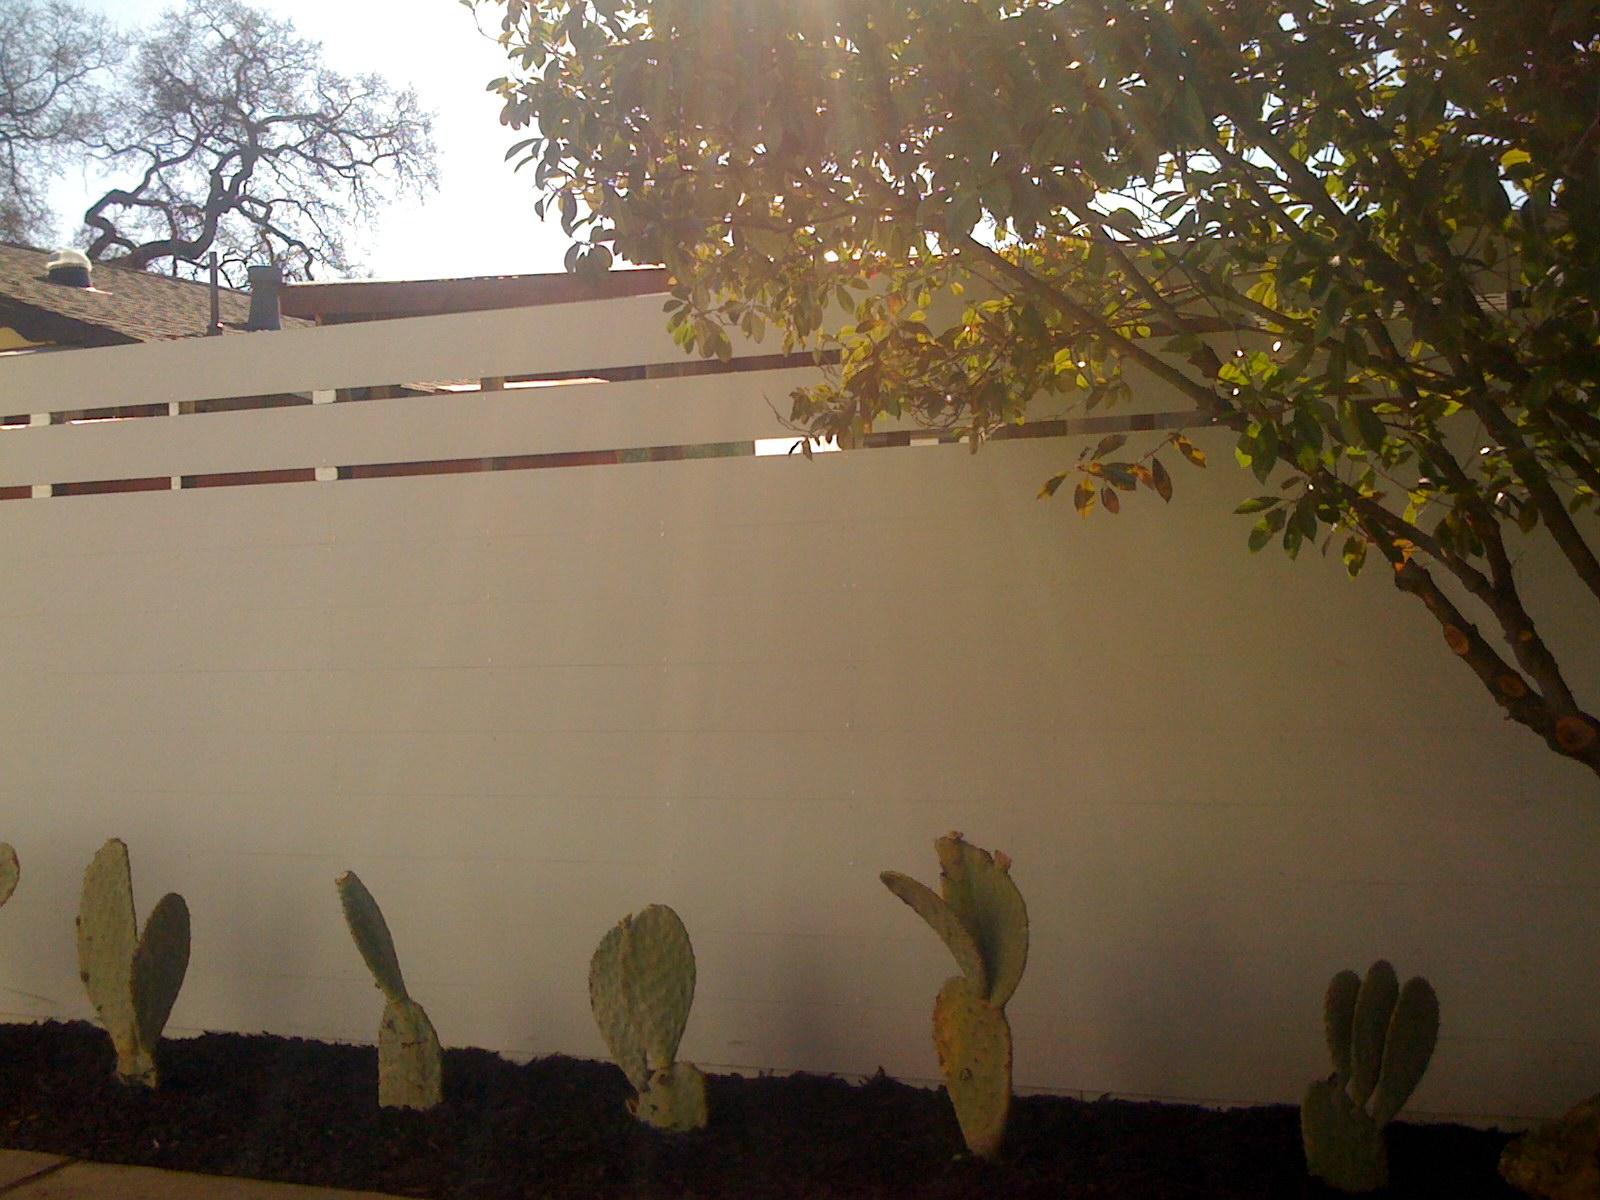 Mod french jewelbox garden sonoma landscape design for Sonoma garden designs